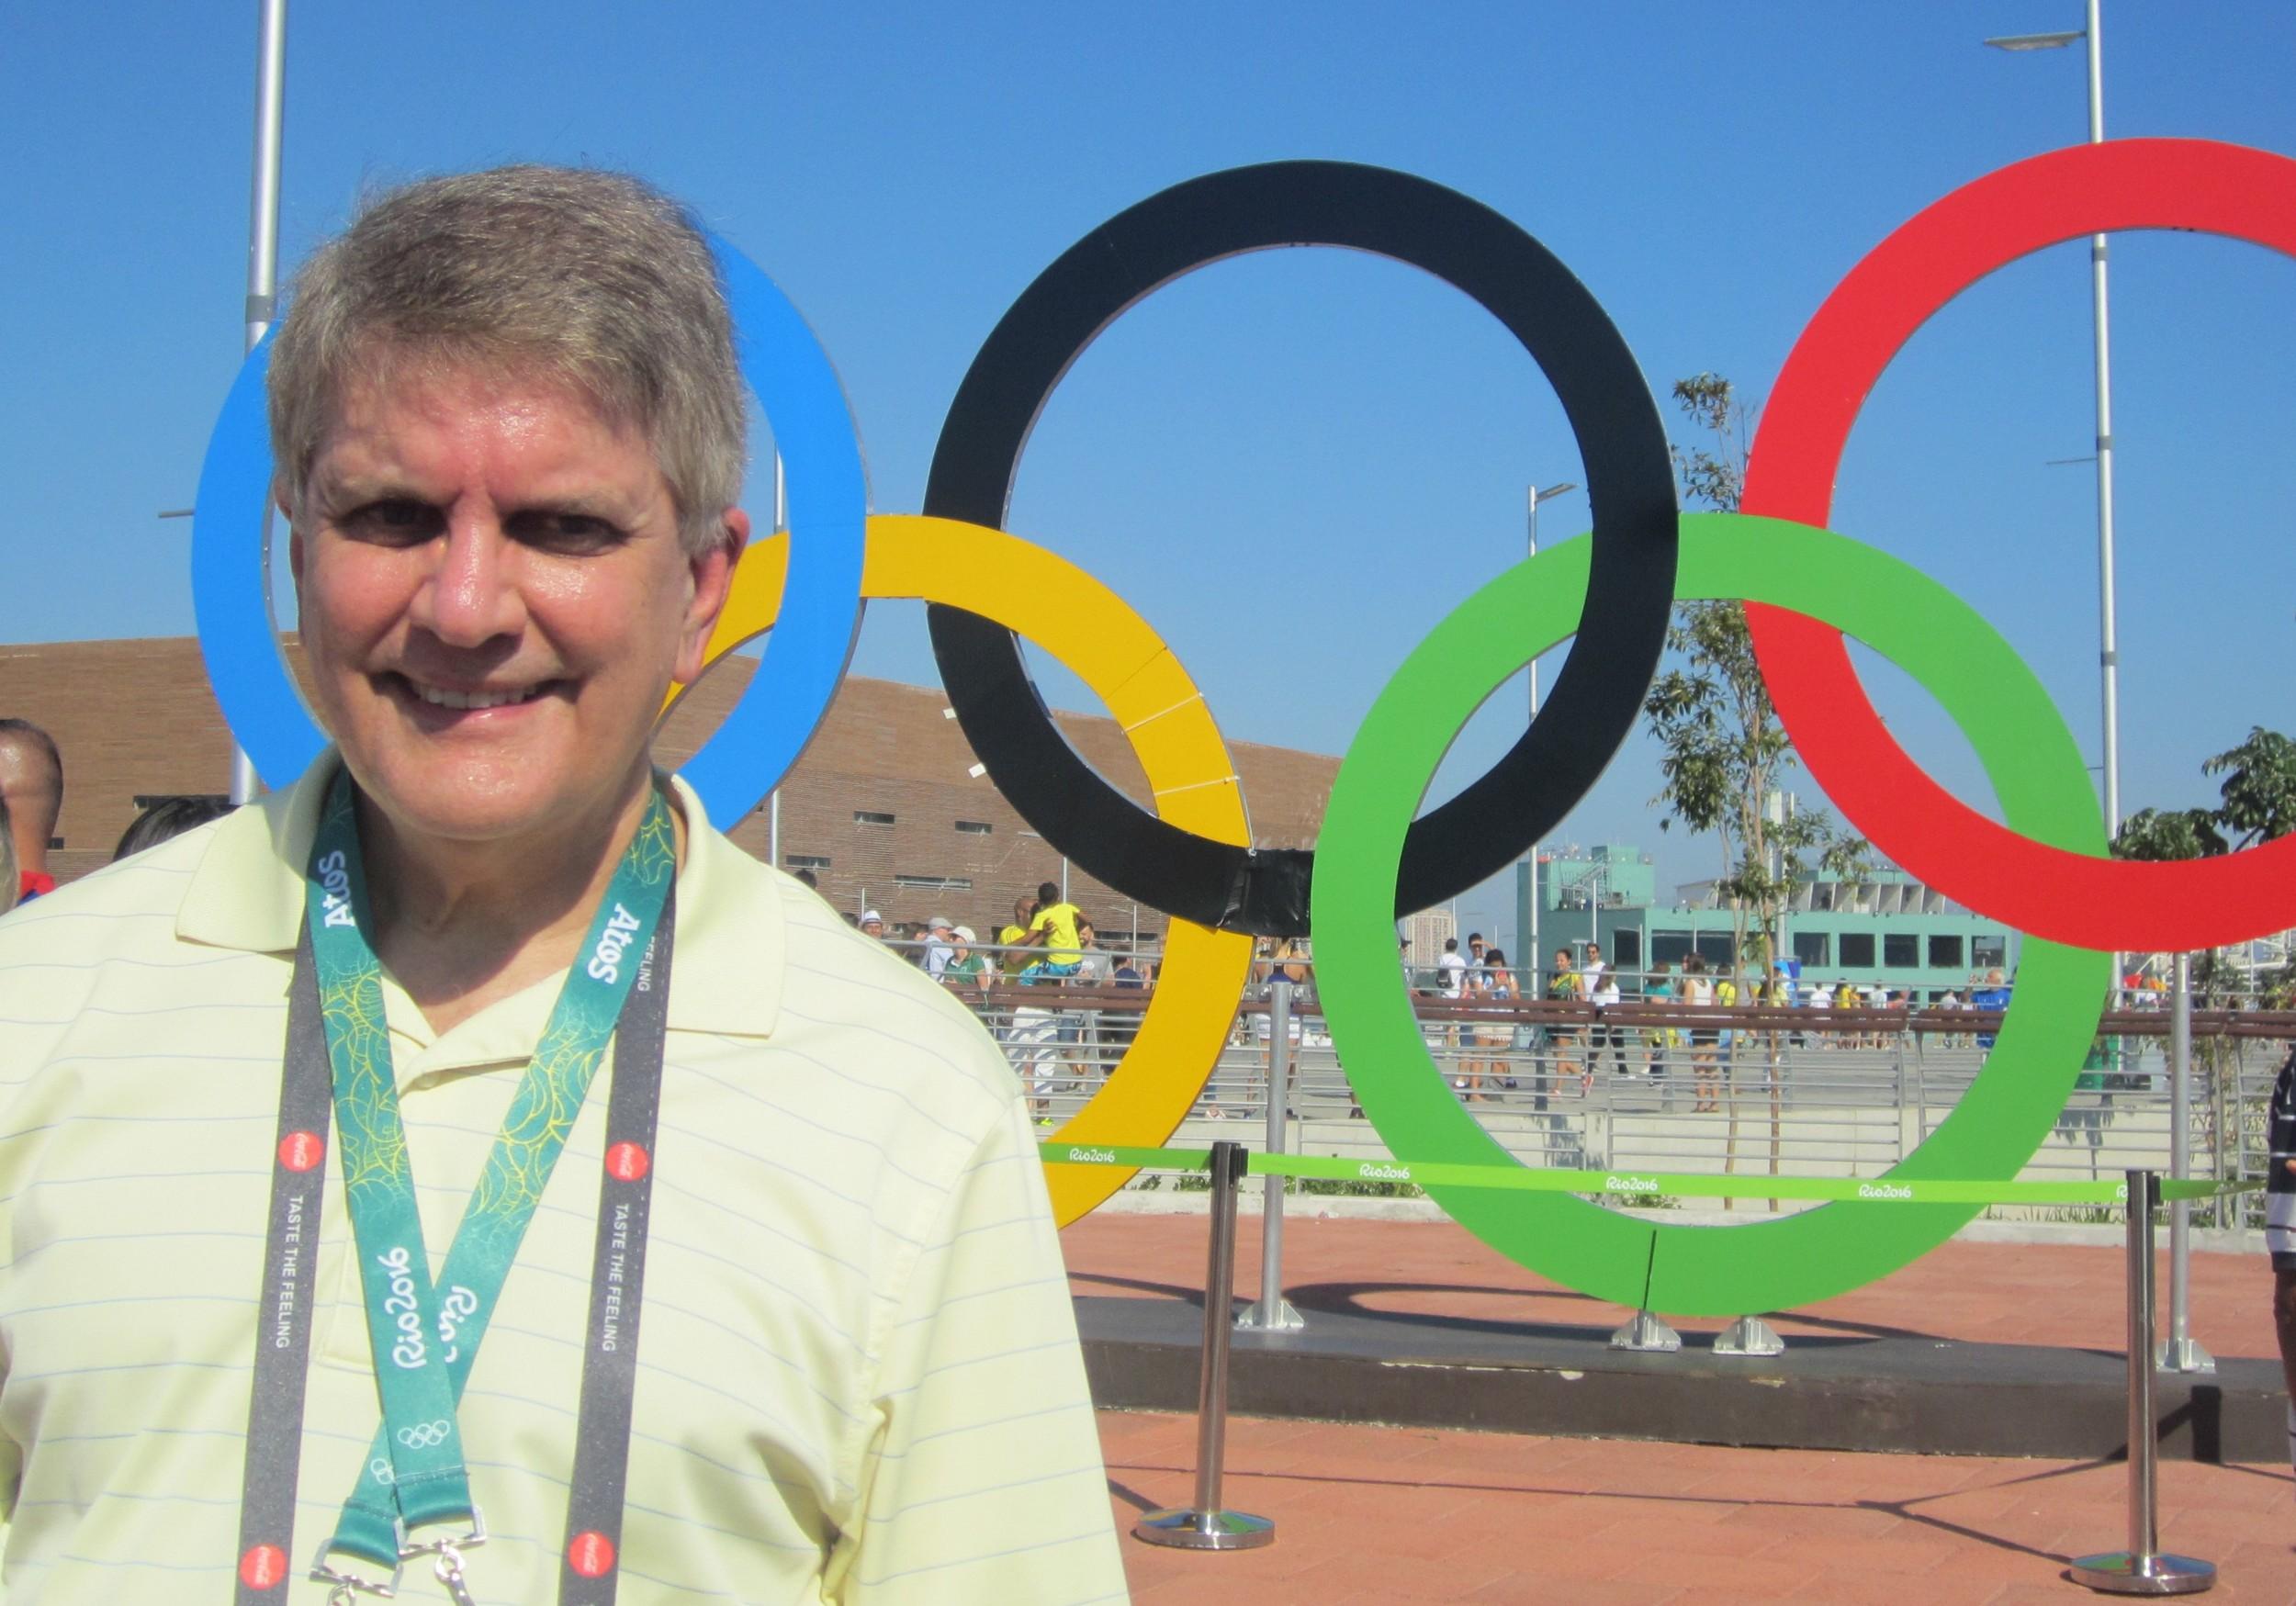 Richard Cunningham at the Rio 2016 Olympics